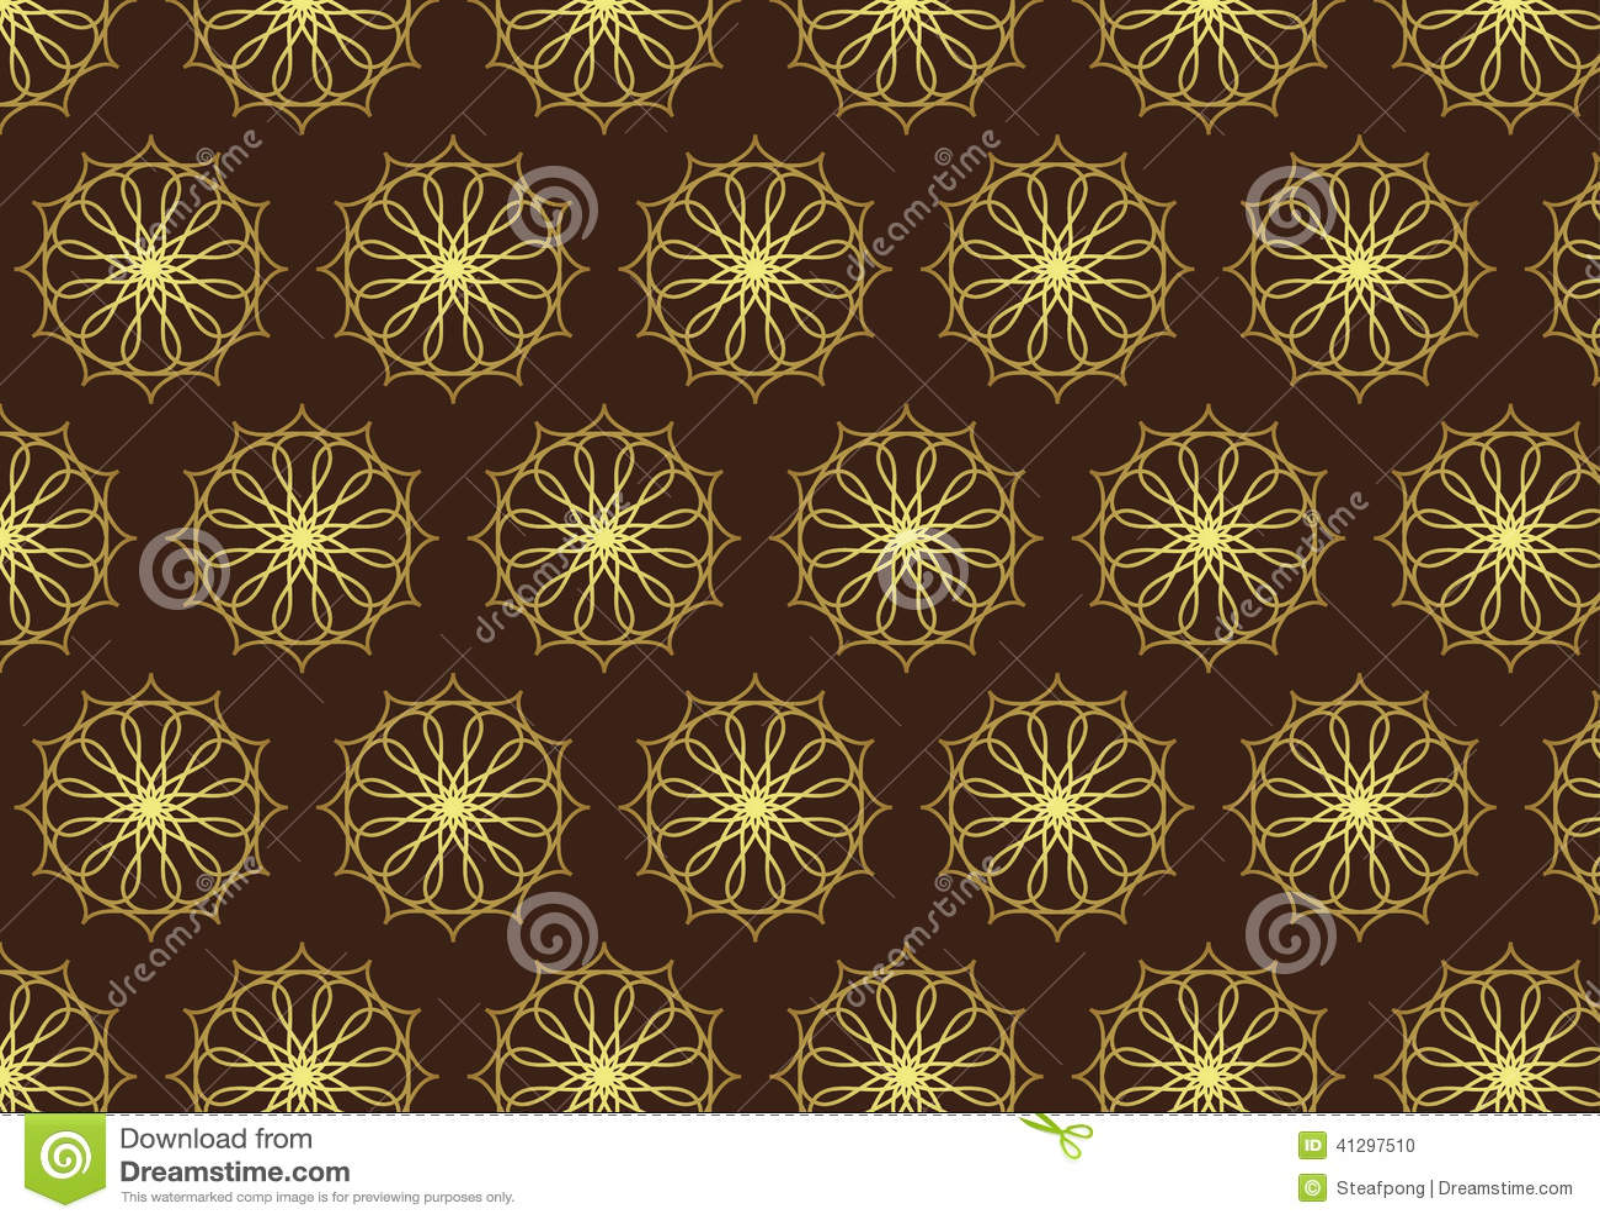 Brown Retro Flower Pattern Royalty Free Stock Image